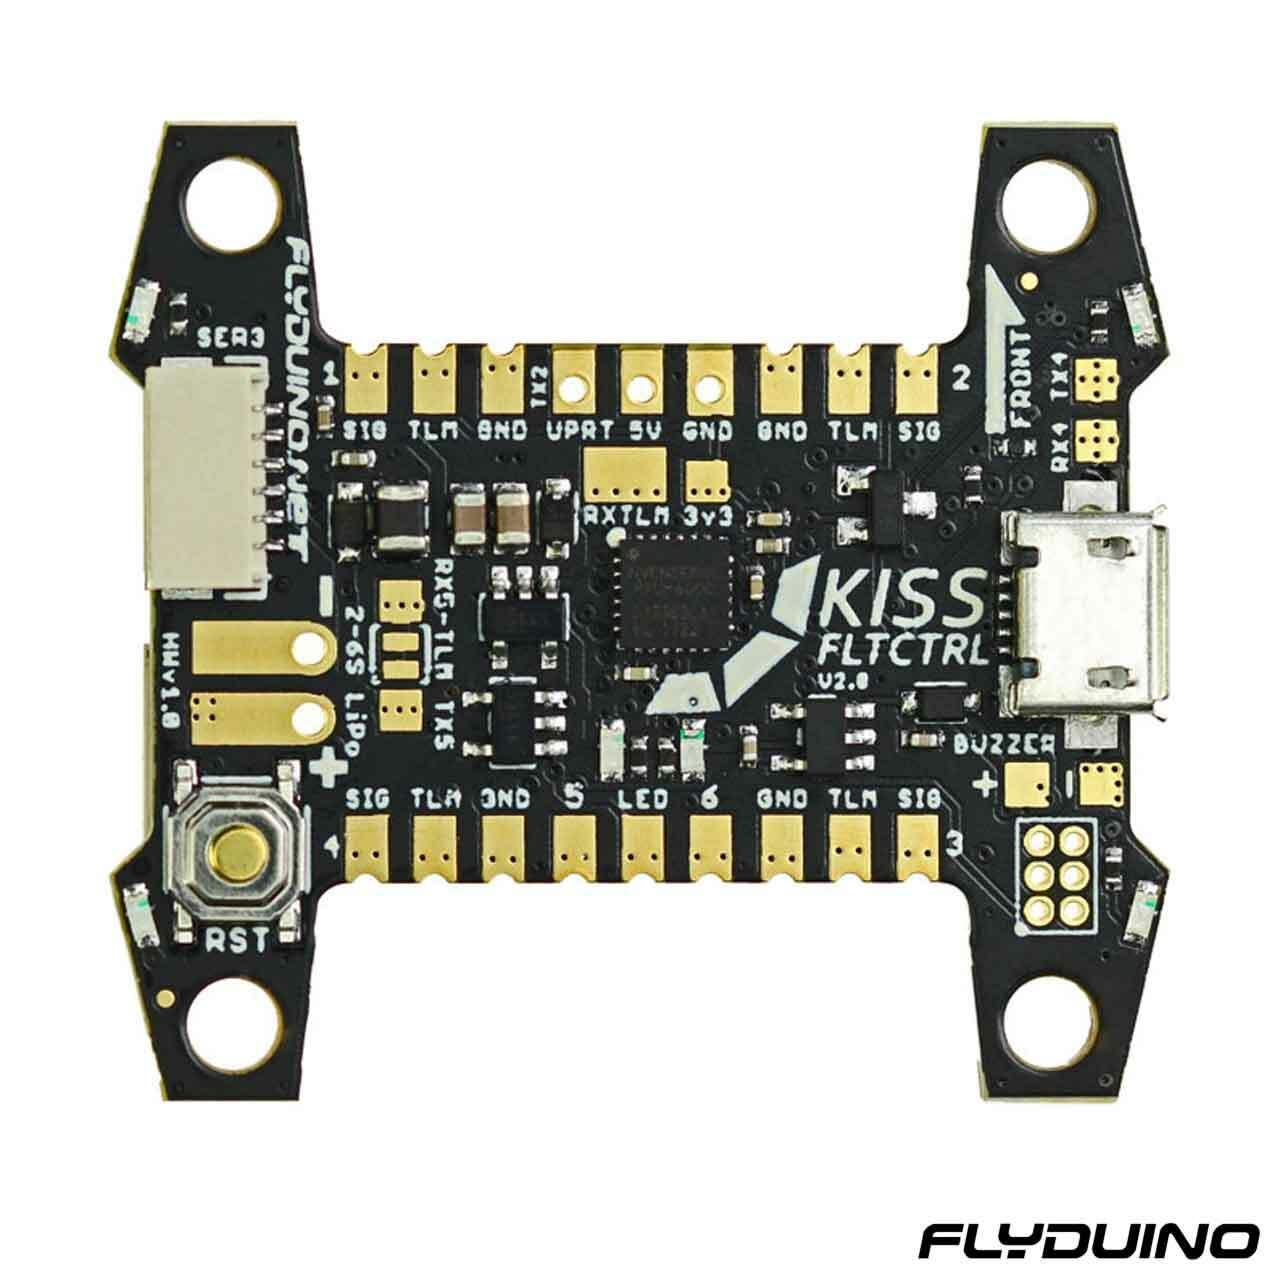 FLYDUINO KISS FC V2 - 32BIT FLIGHT CONTROLLER